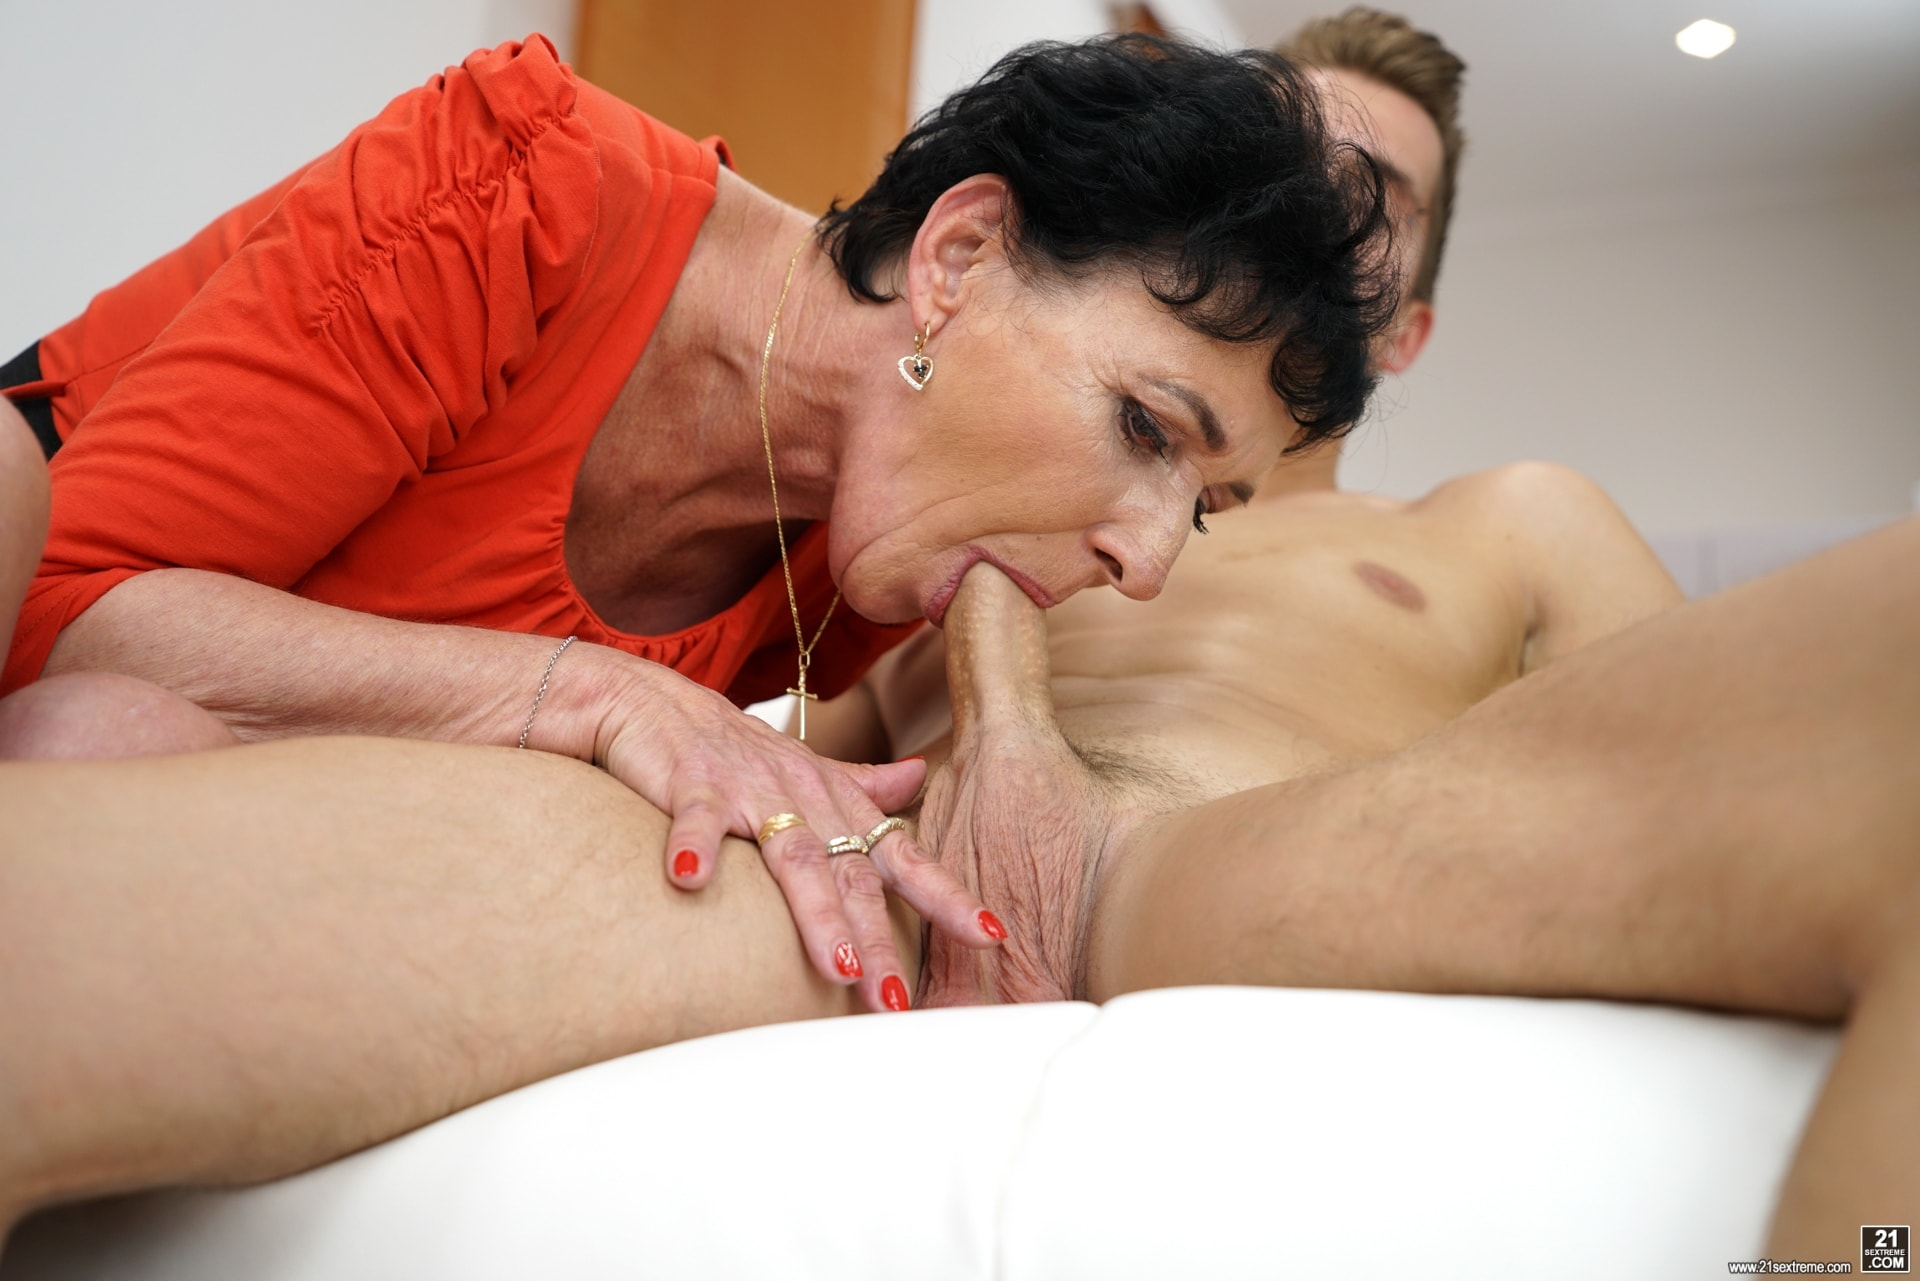 21Sextury 'Leave It To Grandma' starring Pixie (Photo 88)